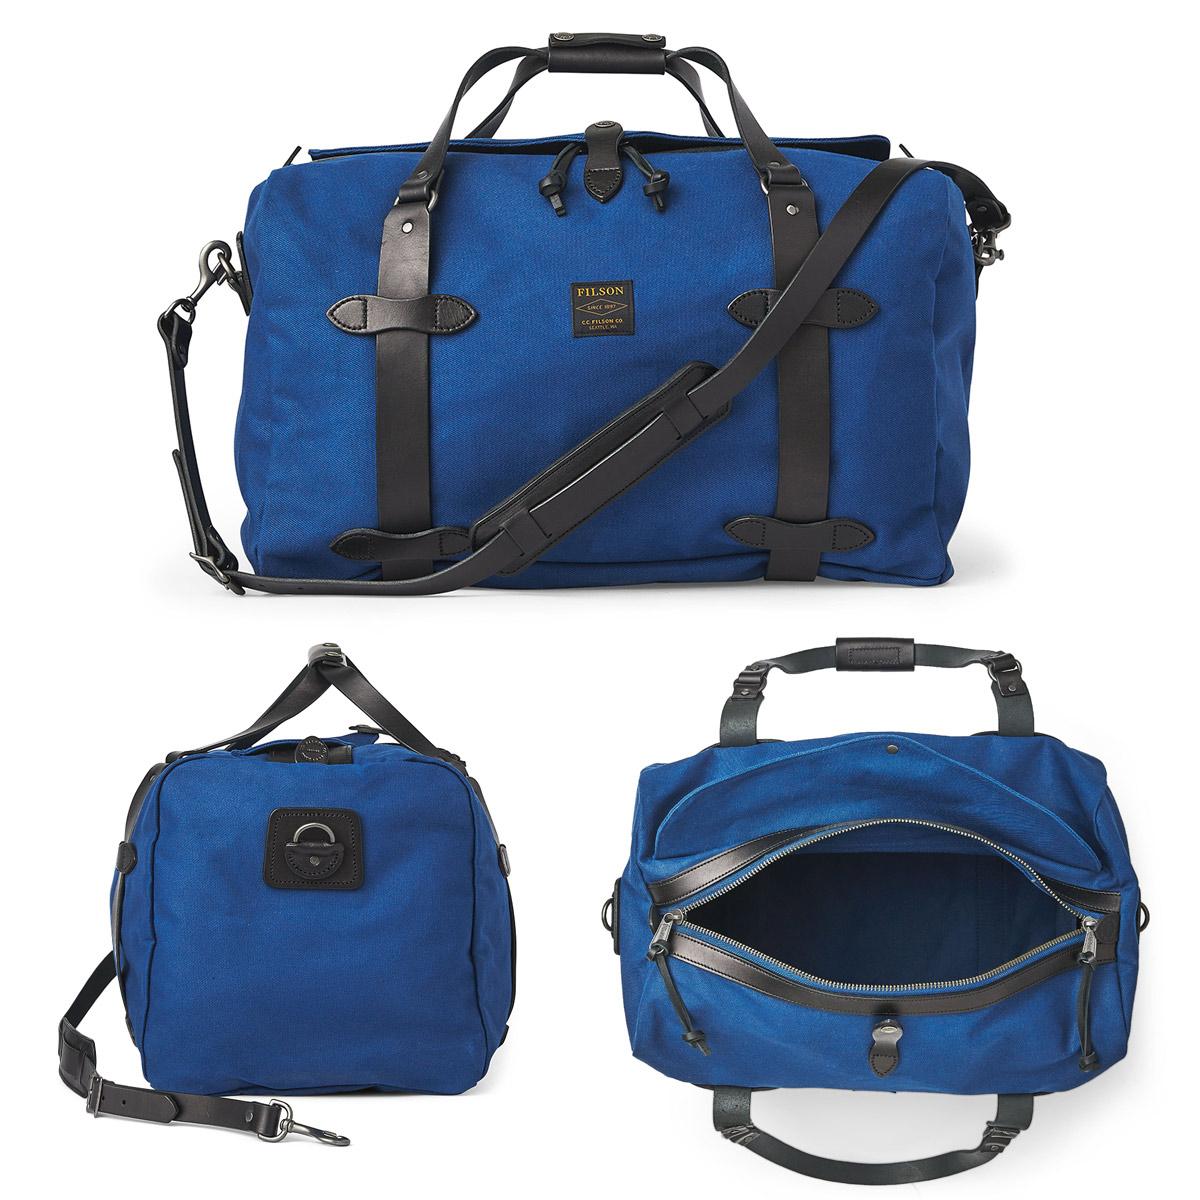 Filson Duffle Medium Flag Blue, stoere duffel die voldoet aan de maximale handbagage afmetingen